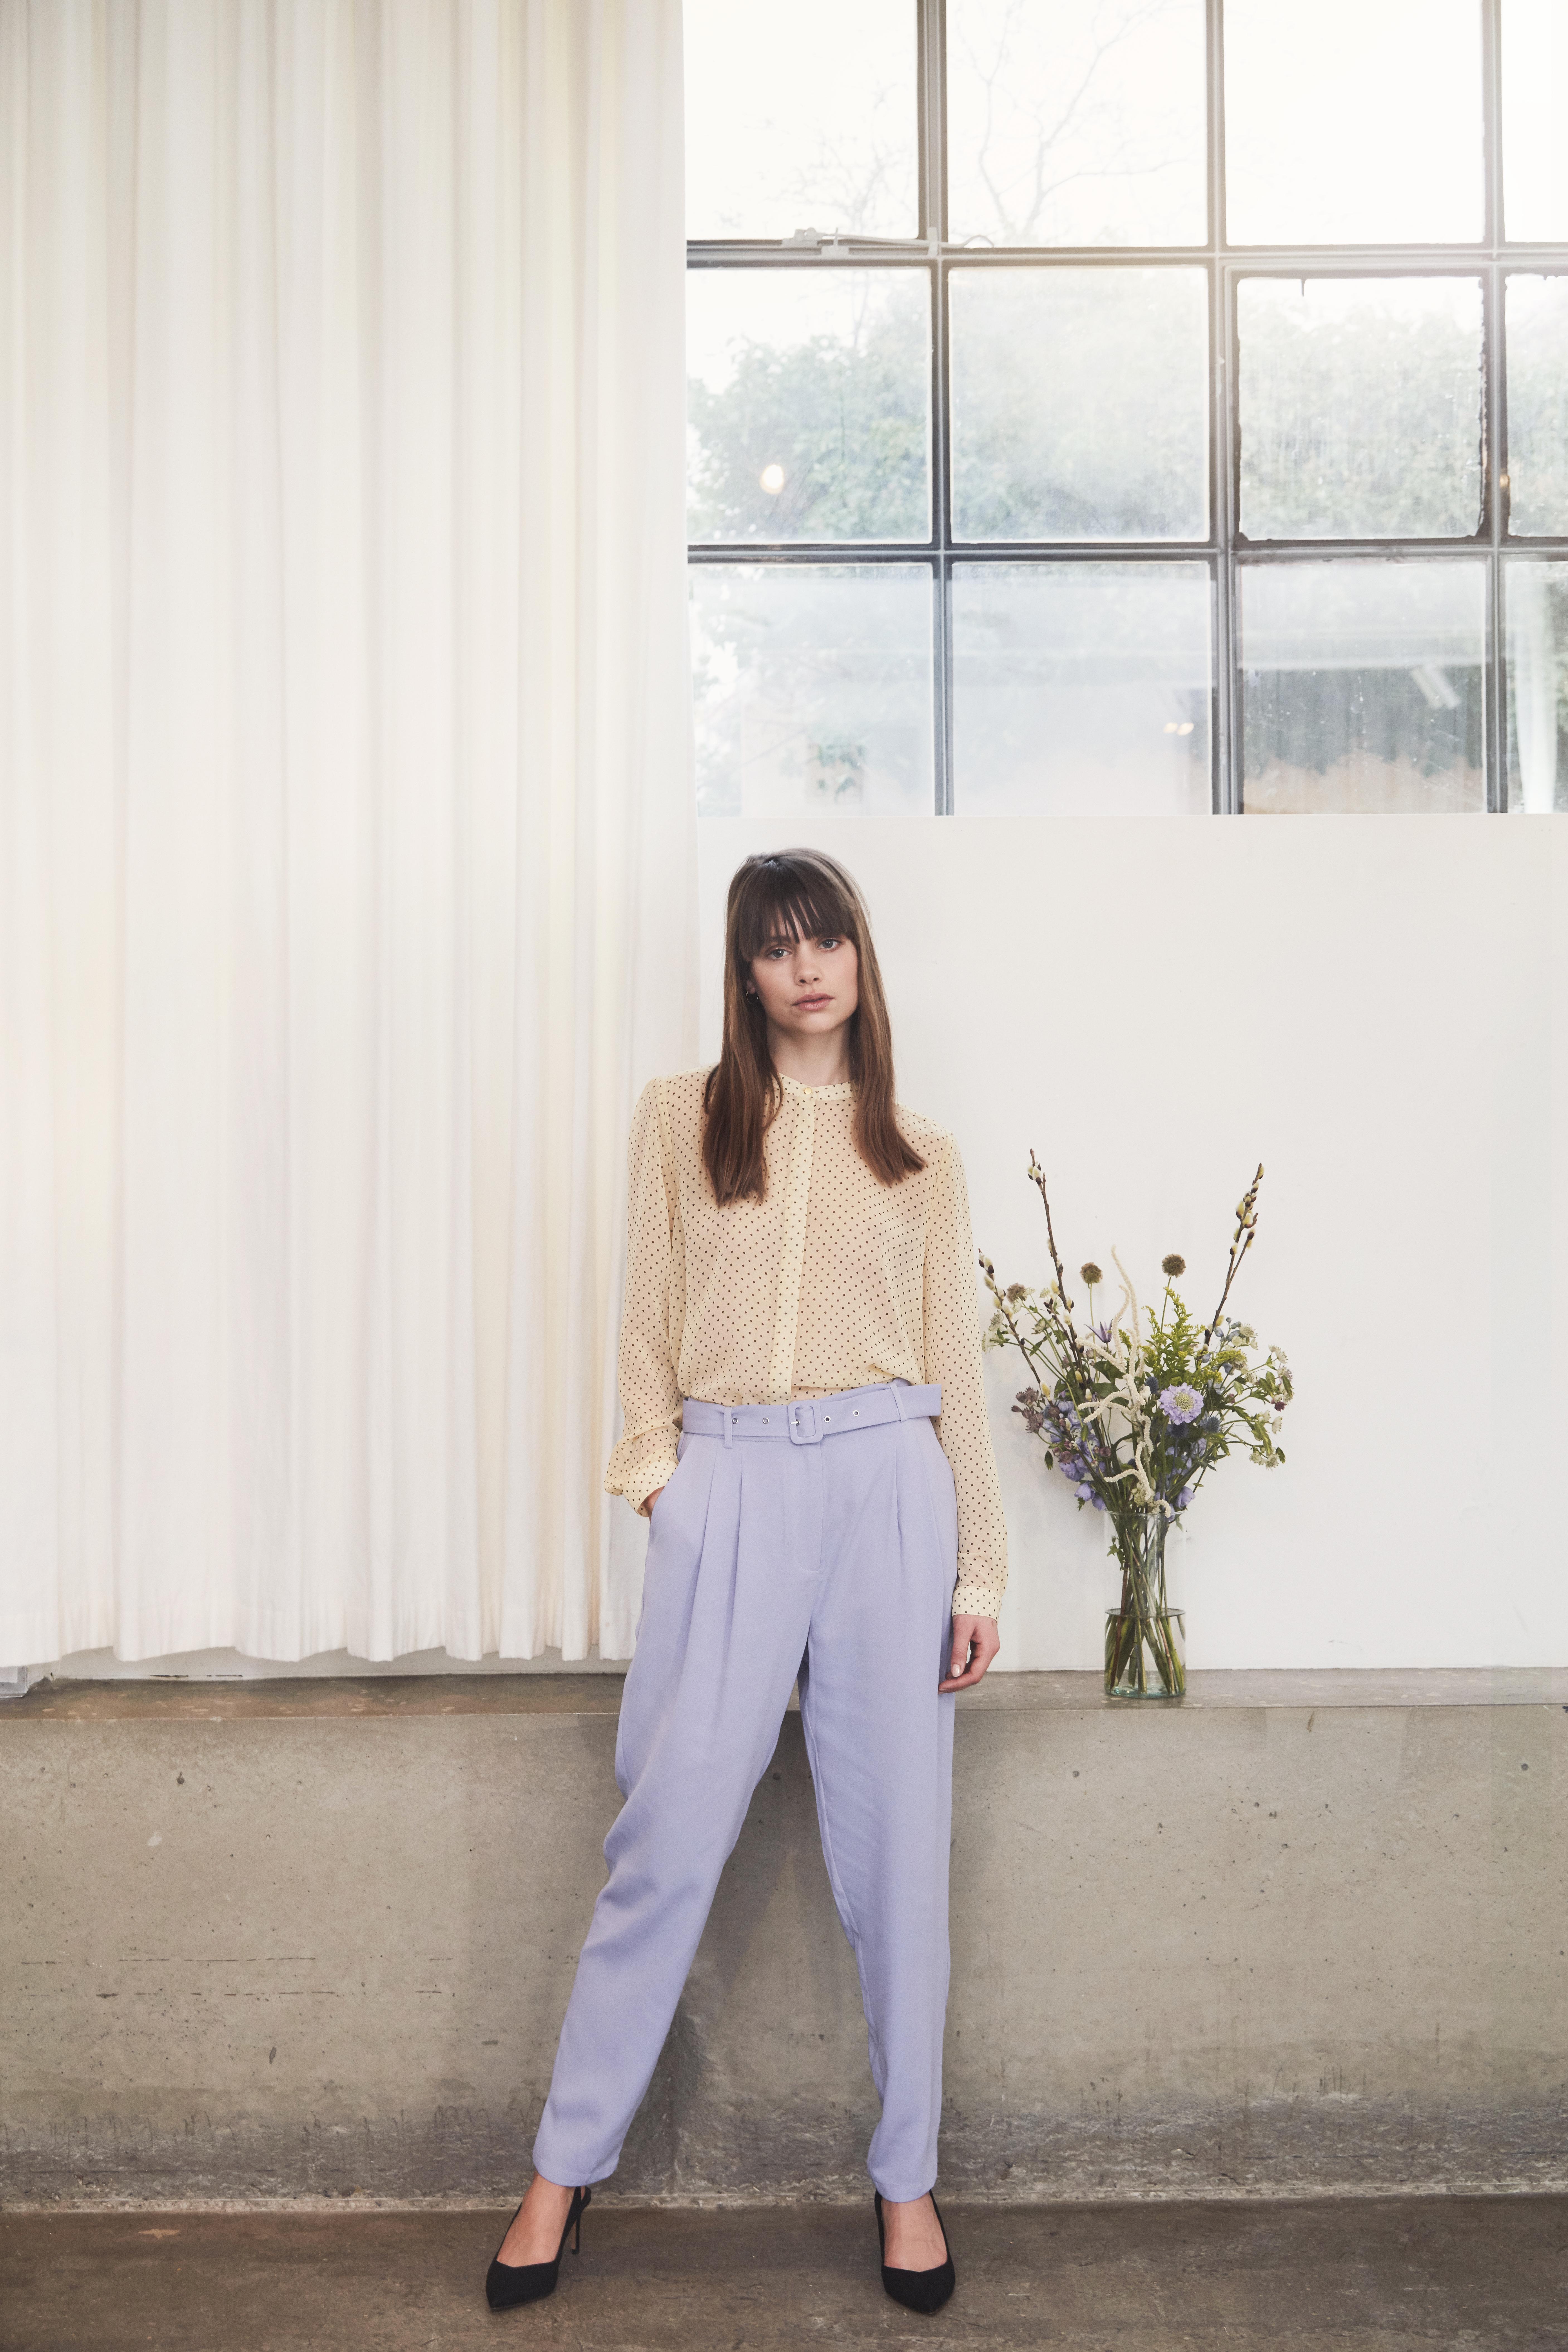 Sweet Lavender Pants Casual – Køb Sweet Lavender Pants Casual fra str. 34-42 her